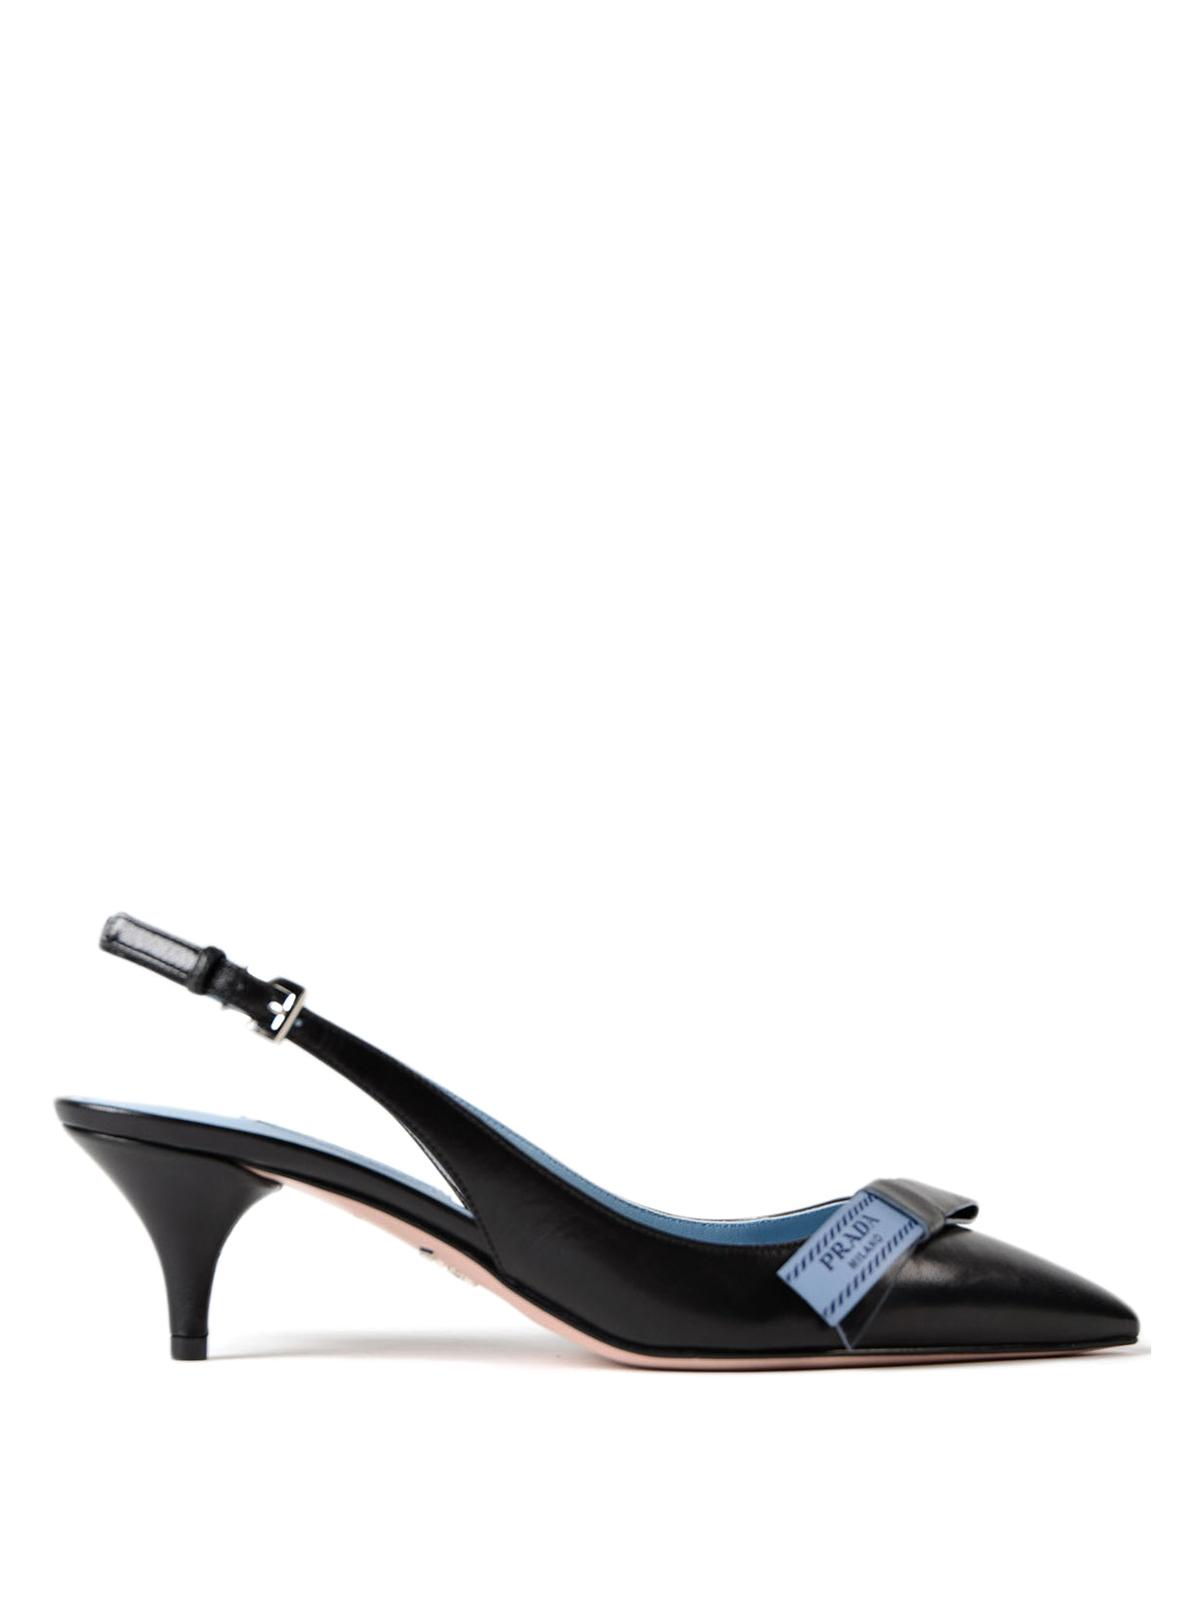 90699bd0ca5d À À À Noir Escarpins Prada Chaussures Talon 1i375i011f0002f055 FYqBpUvwp